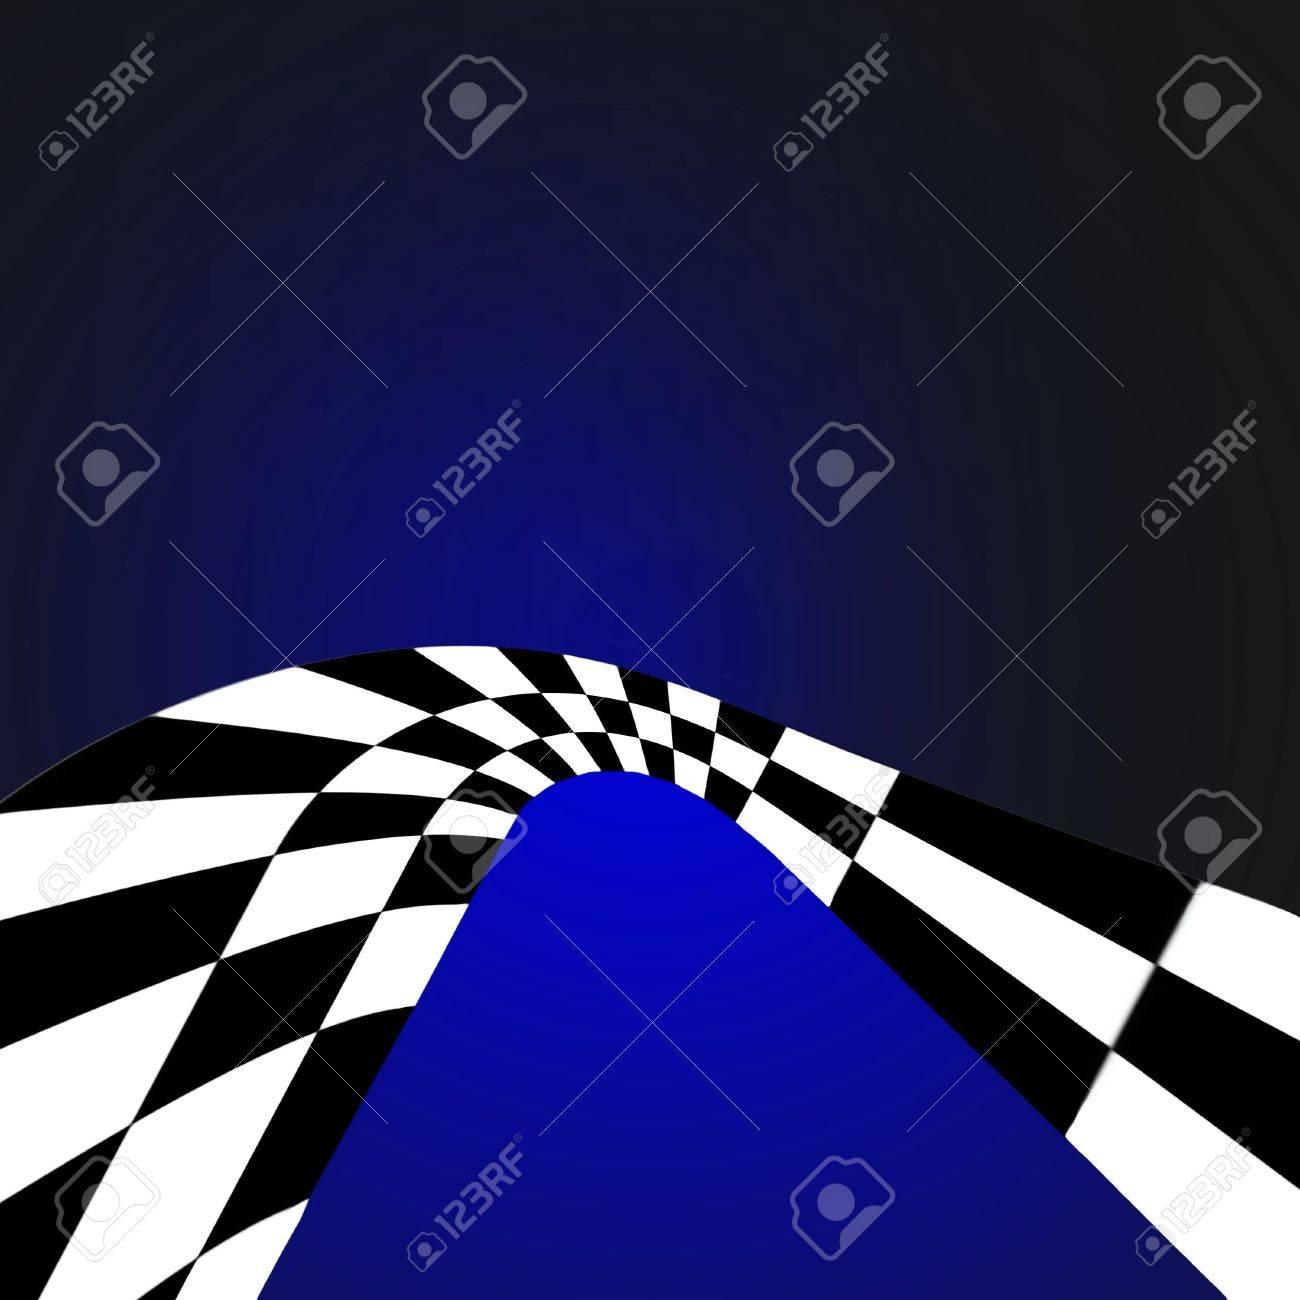 Black And White Checkered Retro Curve On Blue Gradient Stock Photo - 5408050